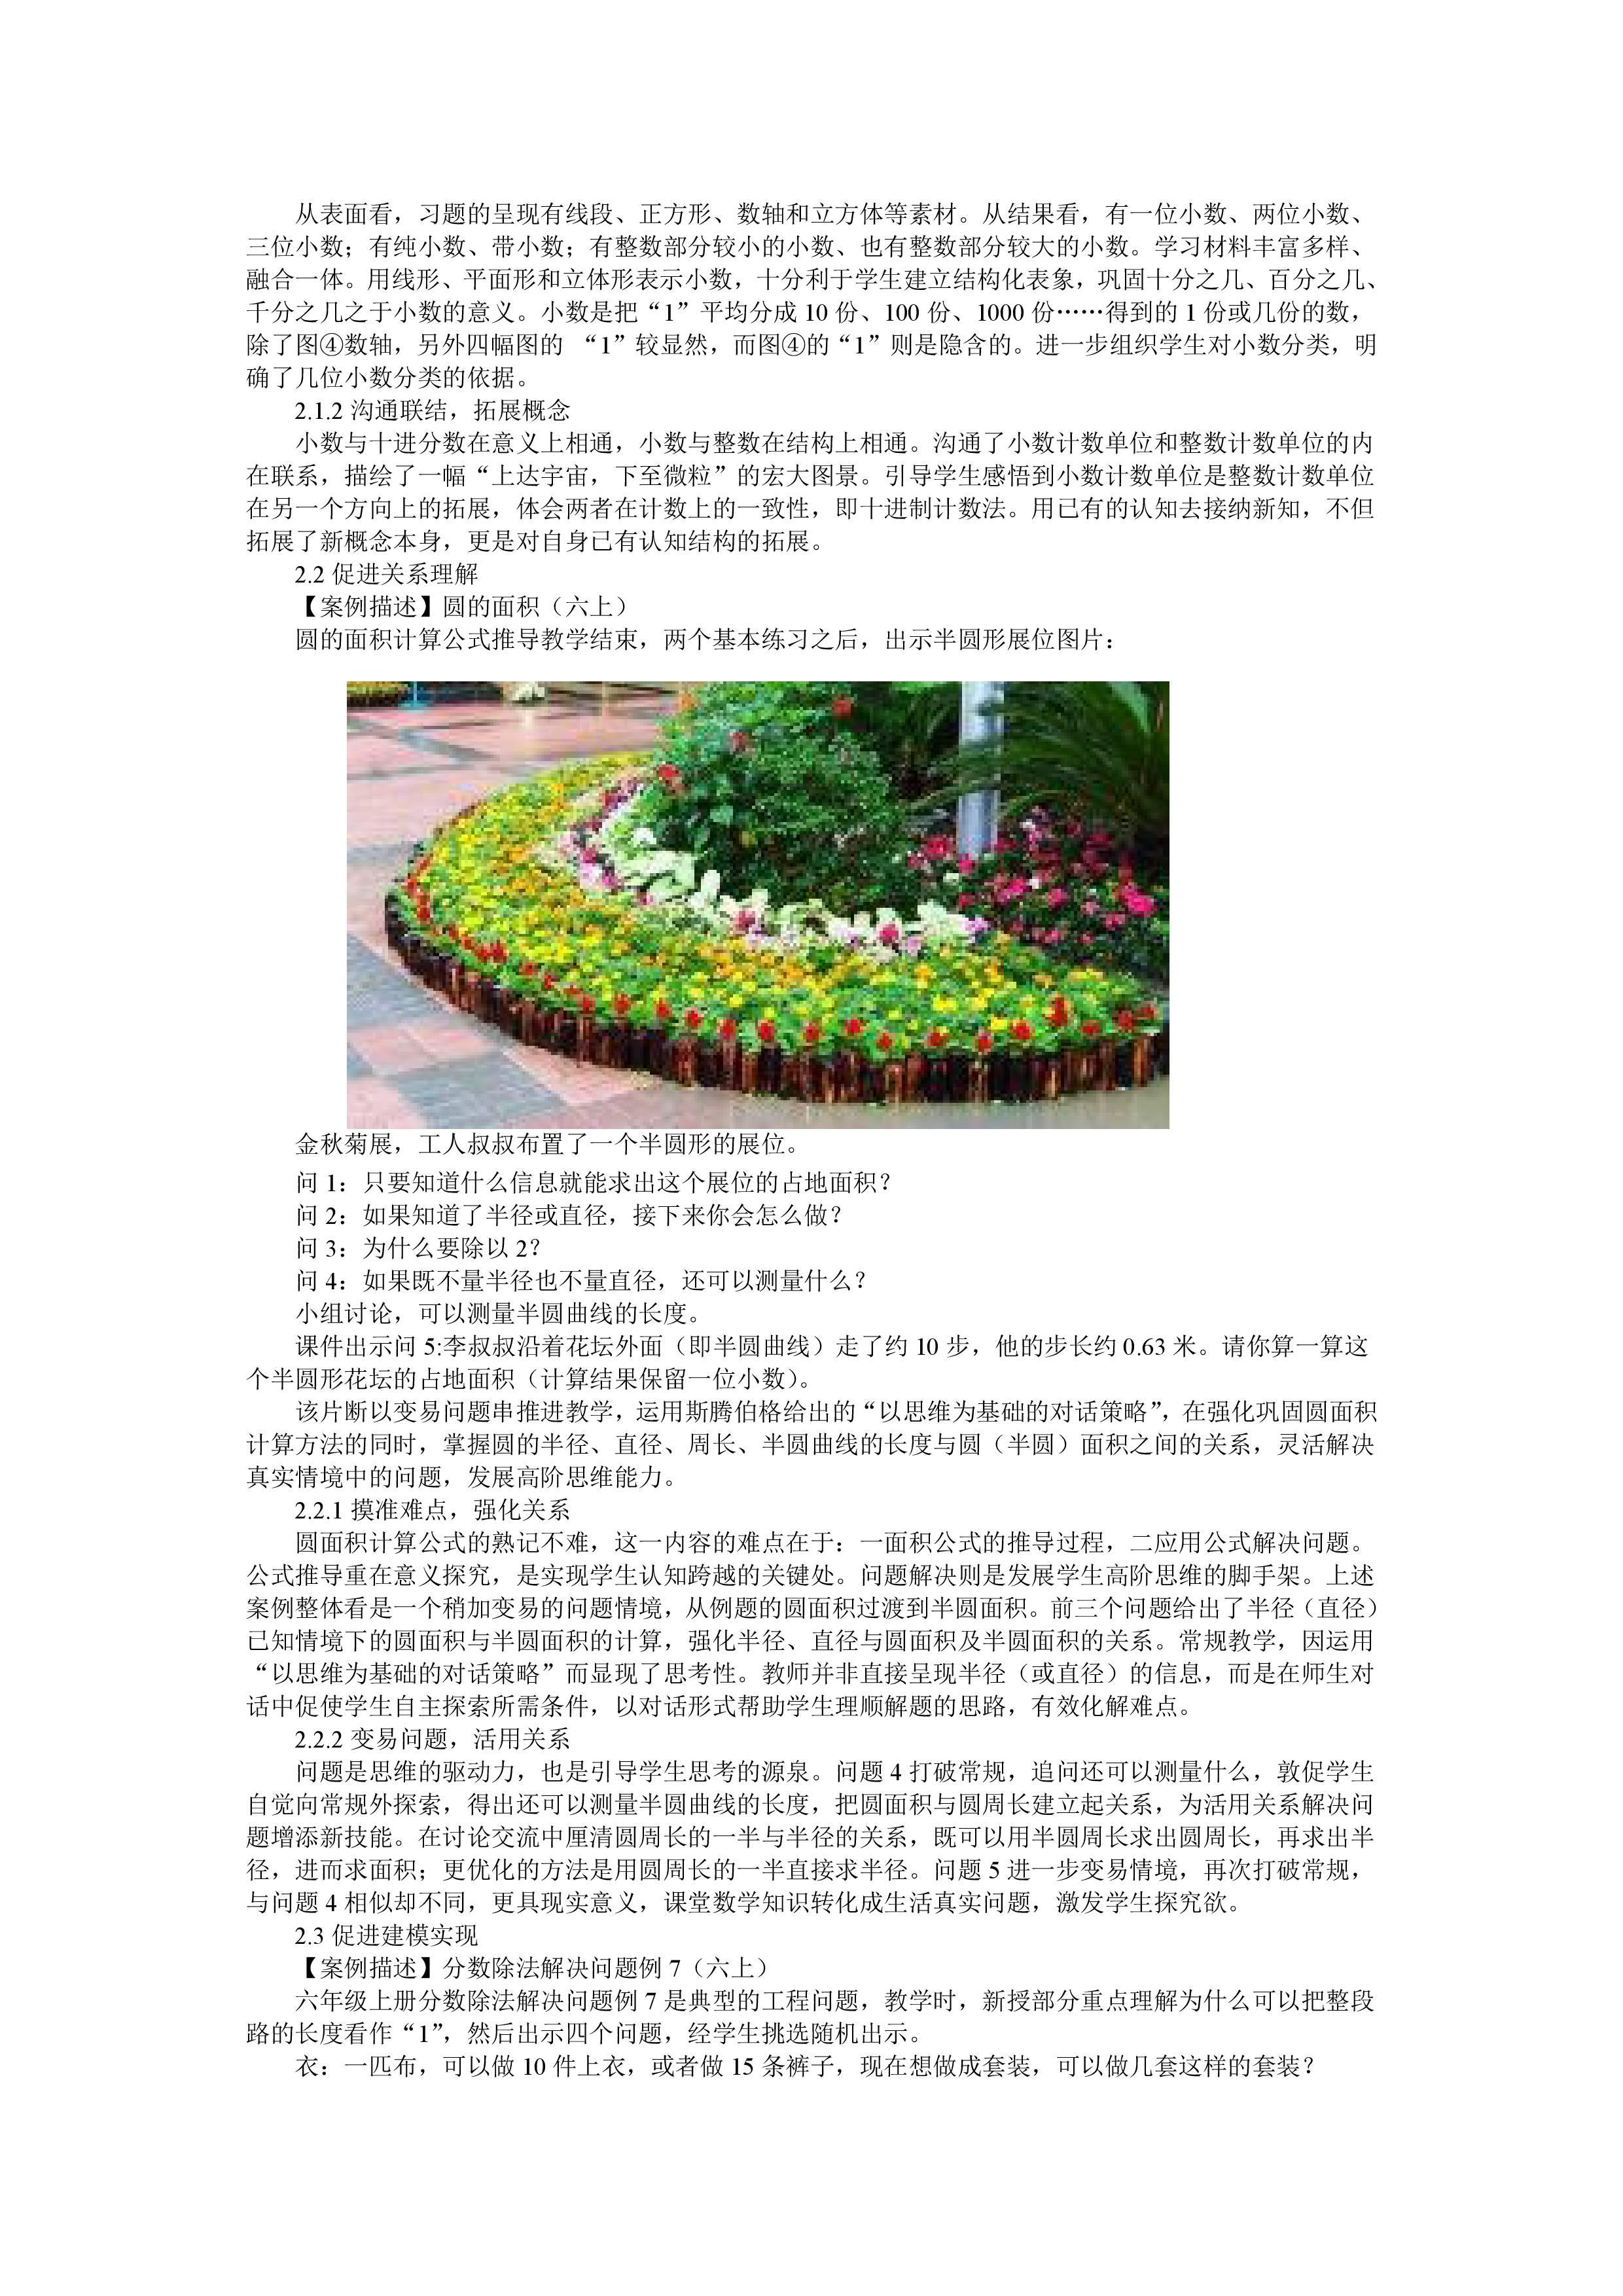 https://z3.ax1x.com/2021/07/26/WRTceH.jpg